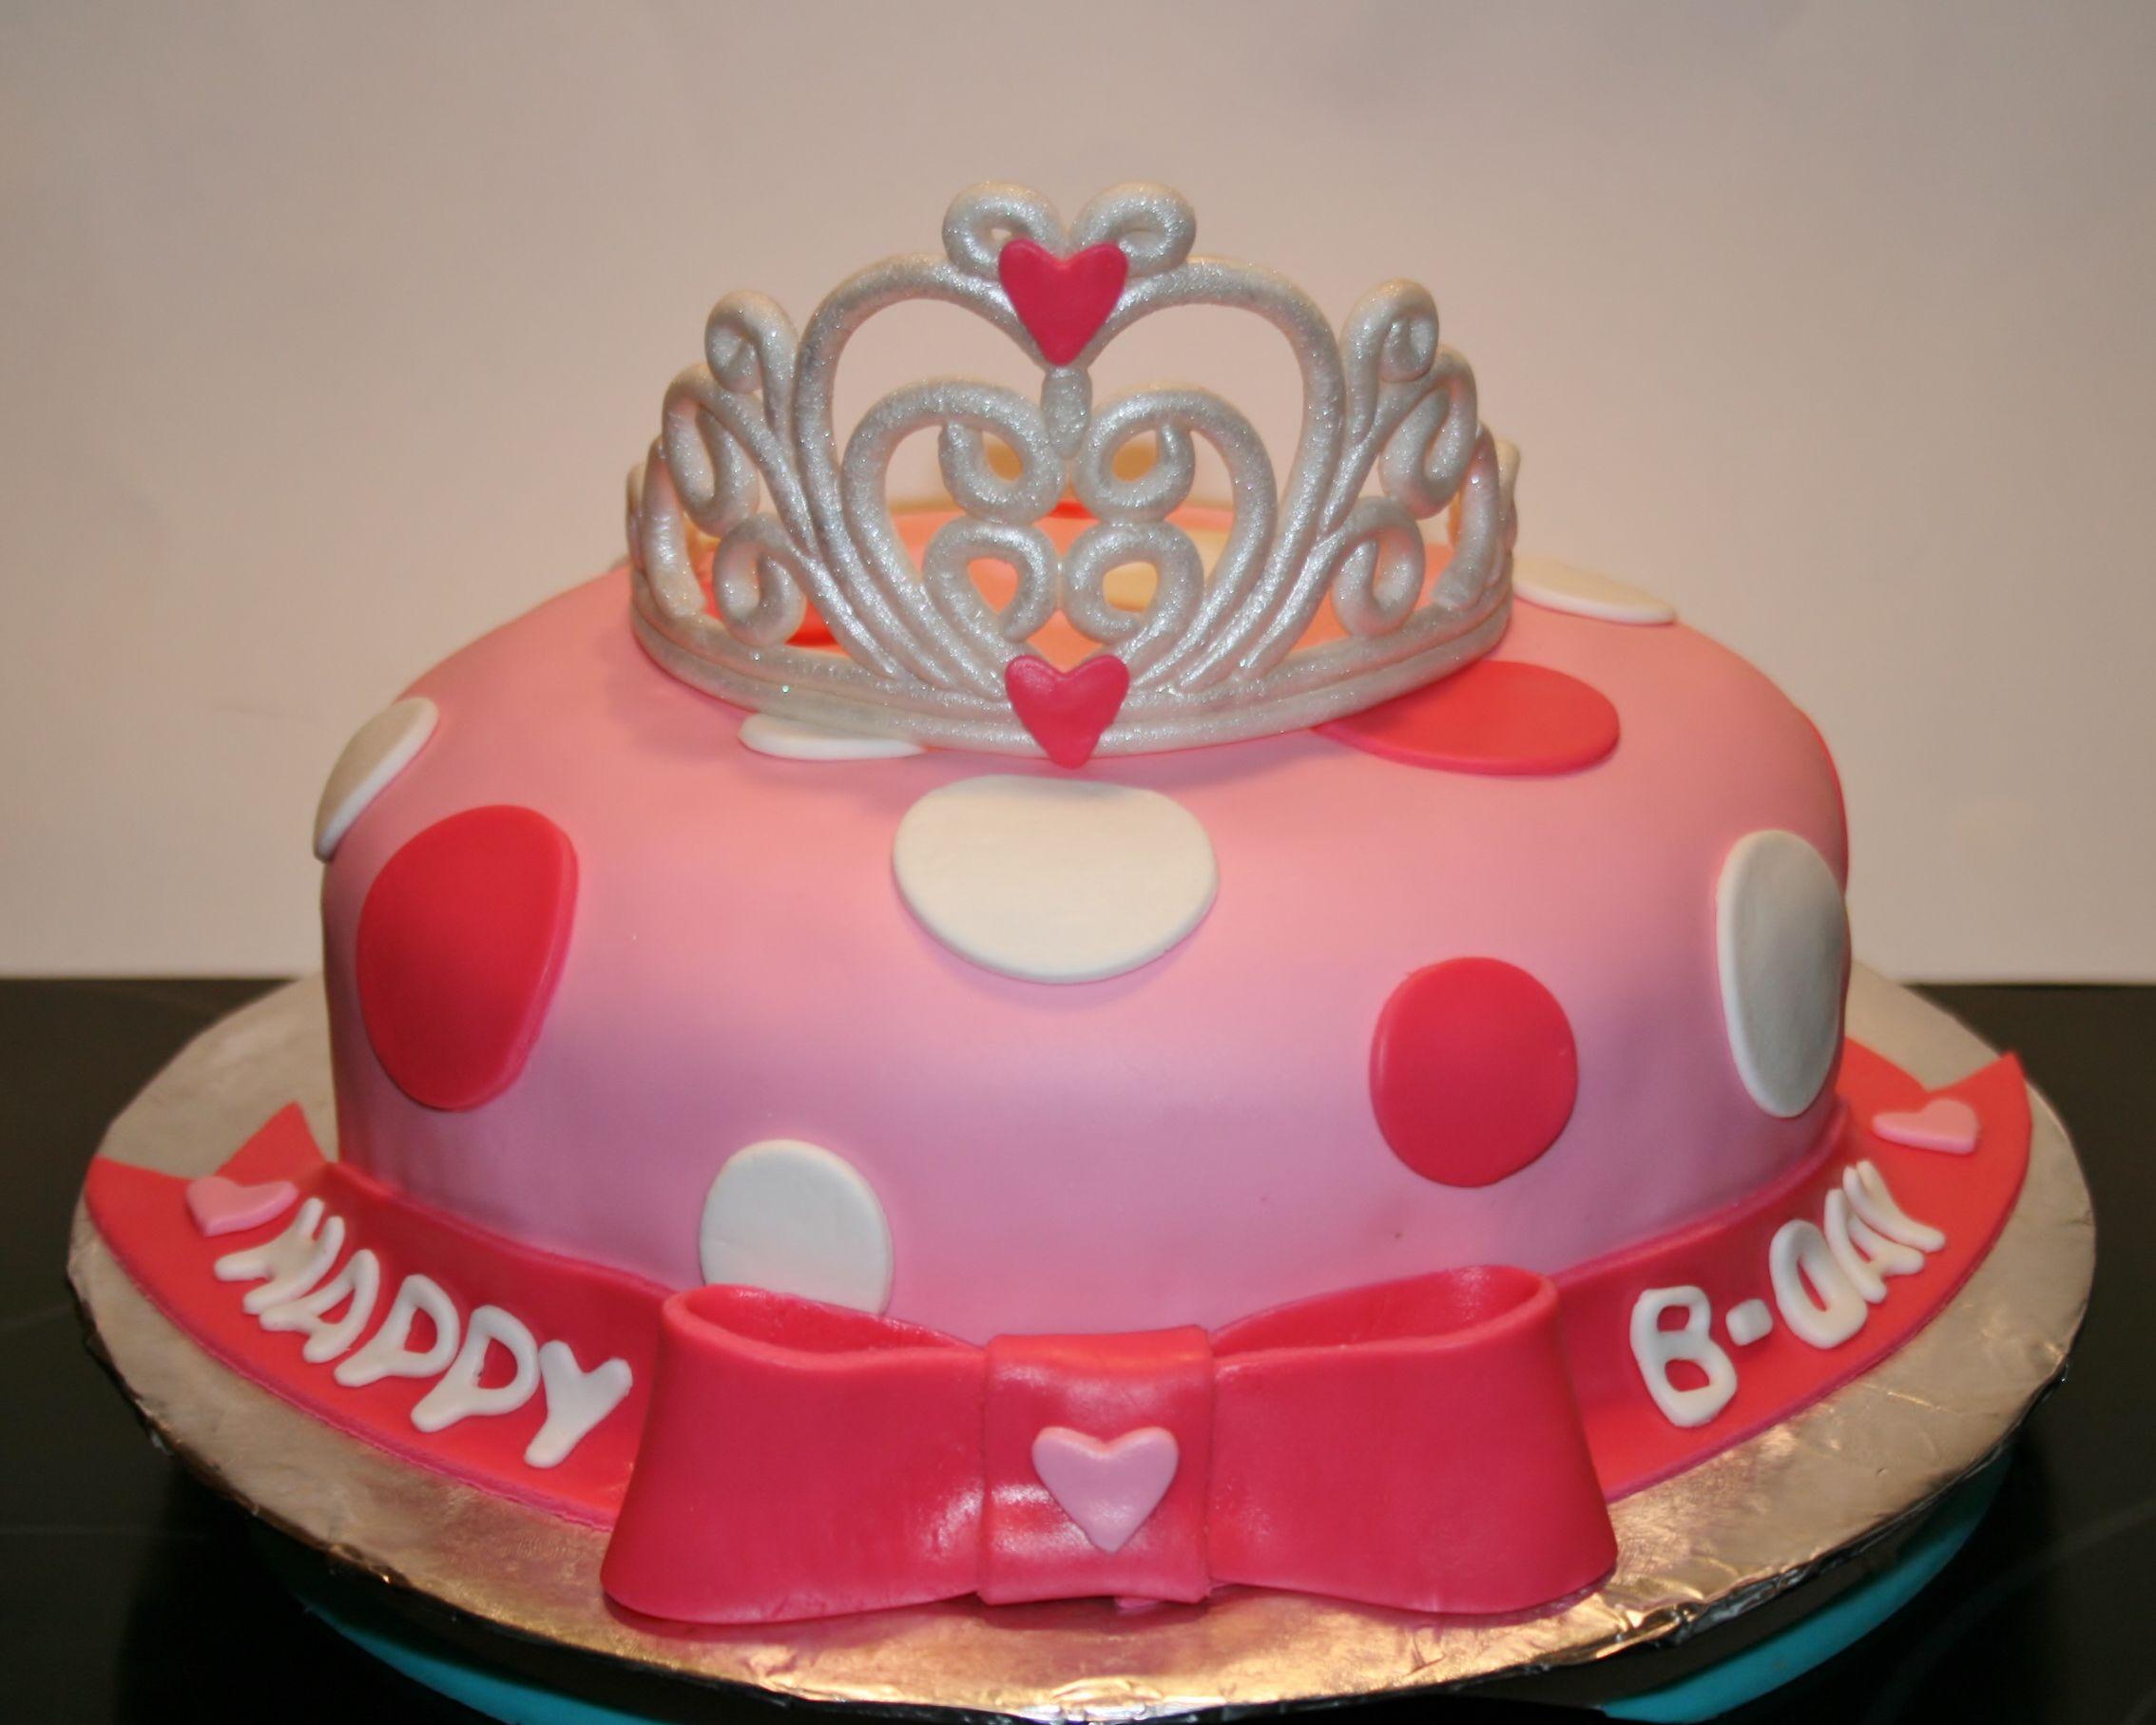 Princess Tiara Cake By Kb Cakes Kbcakes